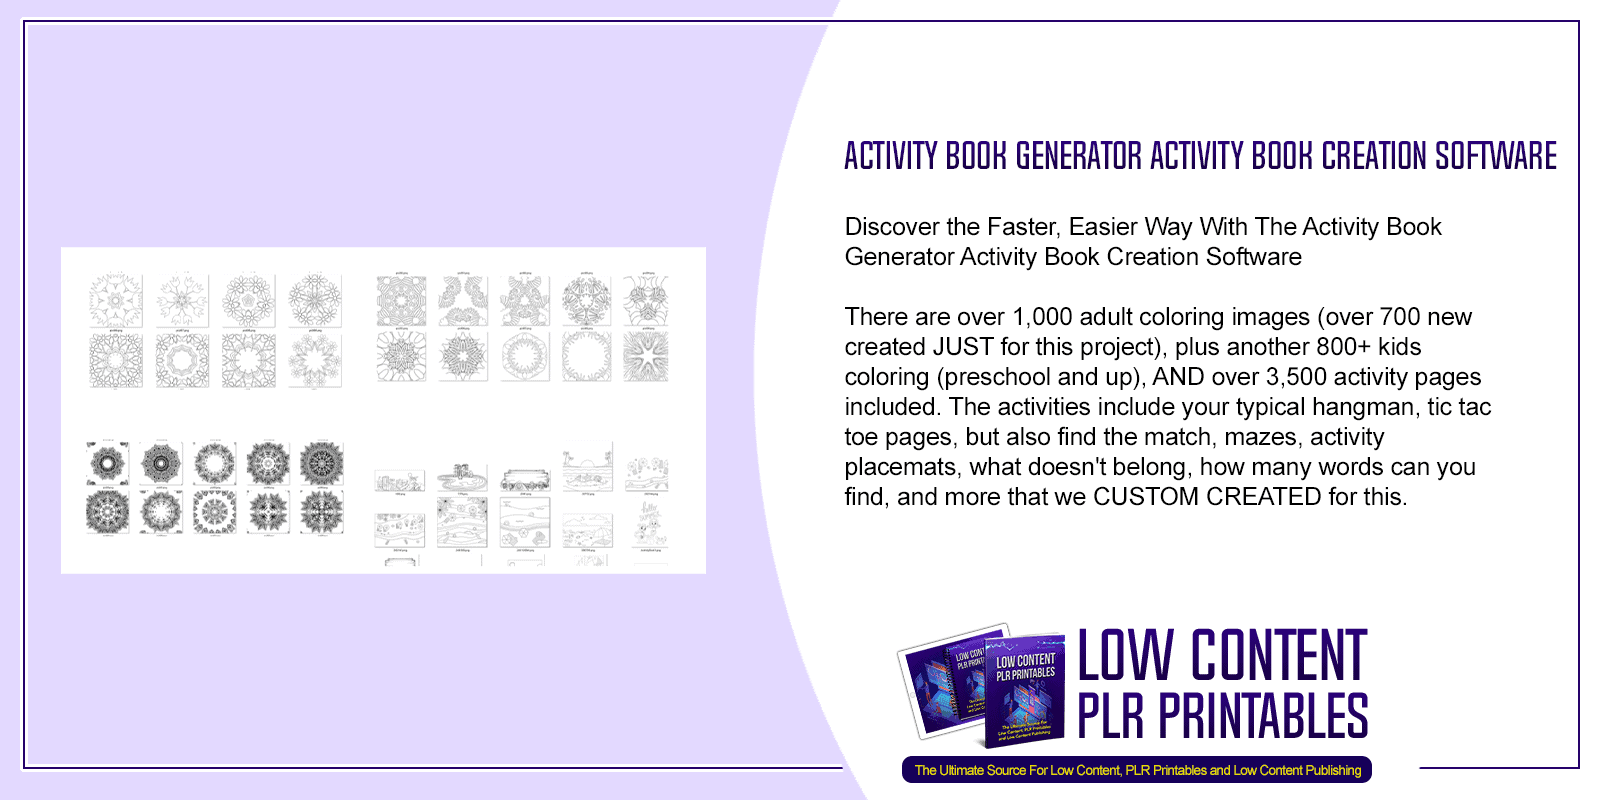 Activity Book Generator Activity Book Creation Software